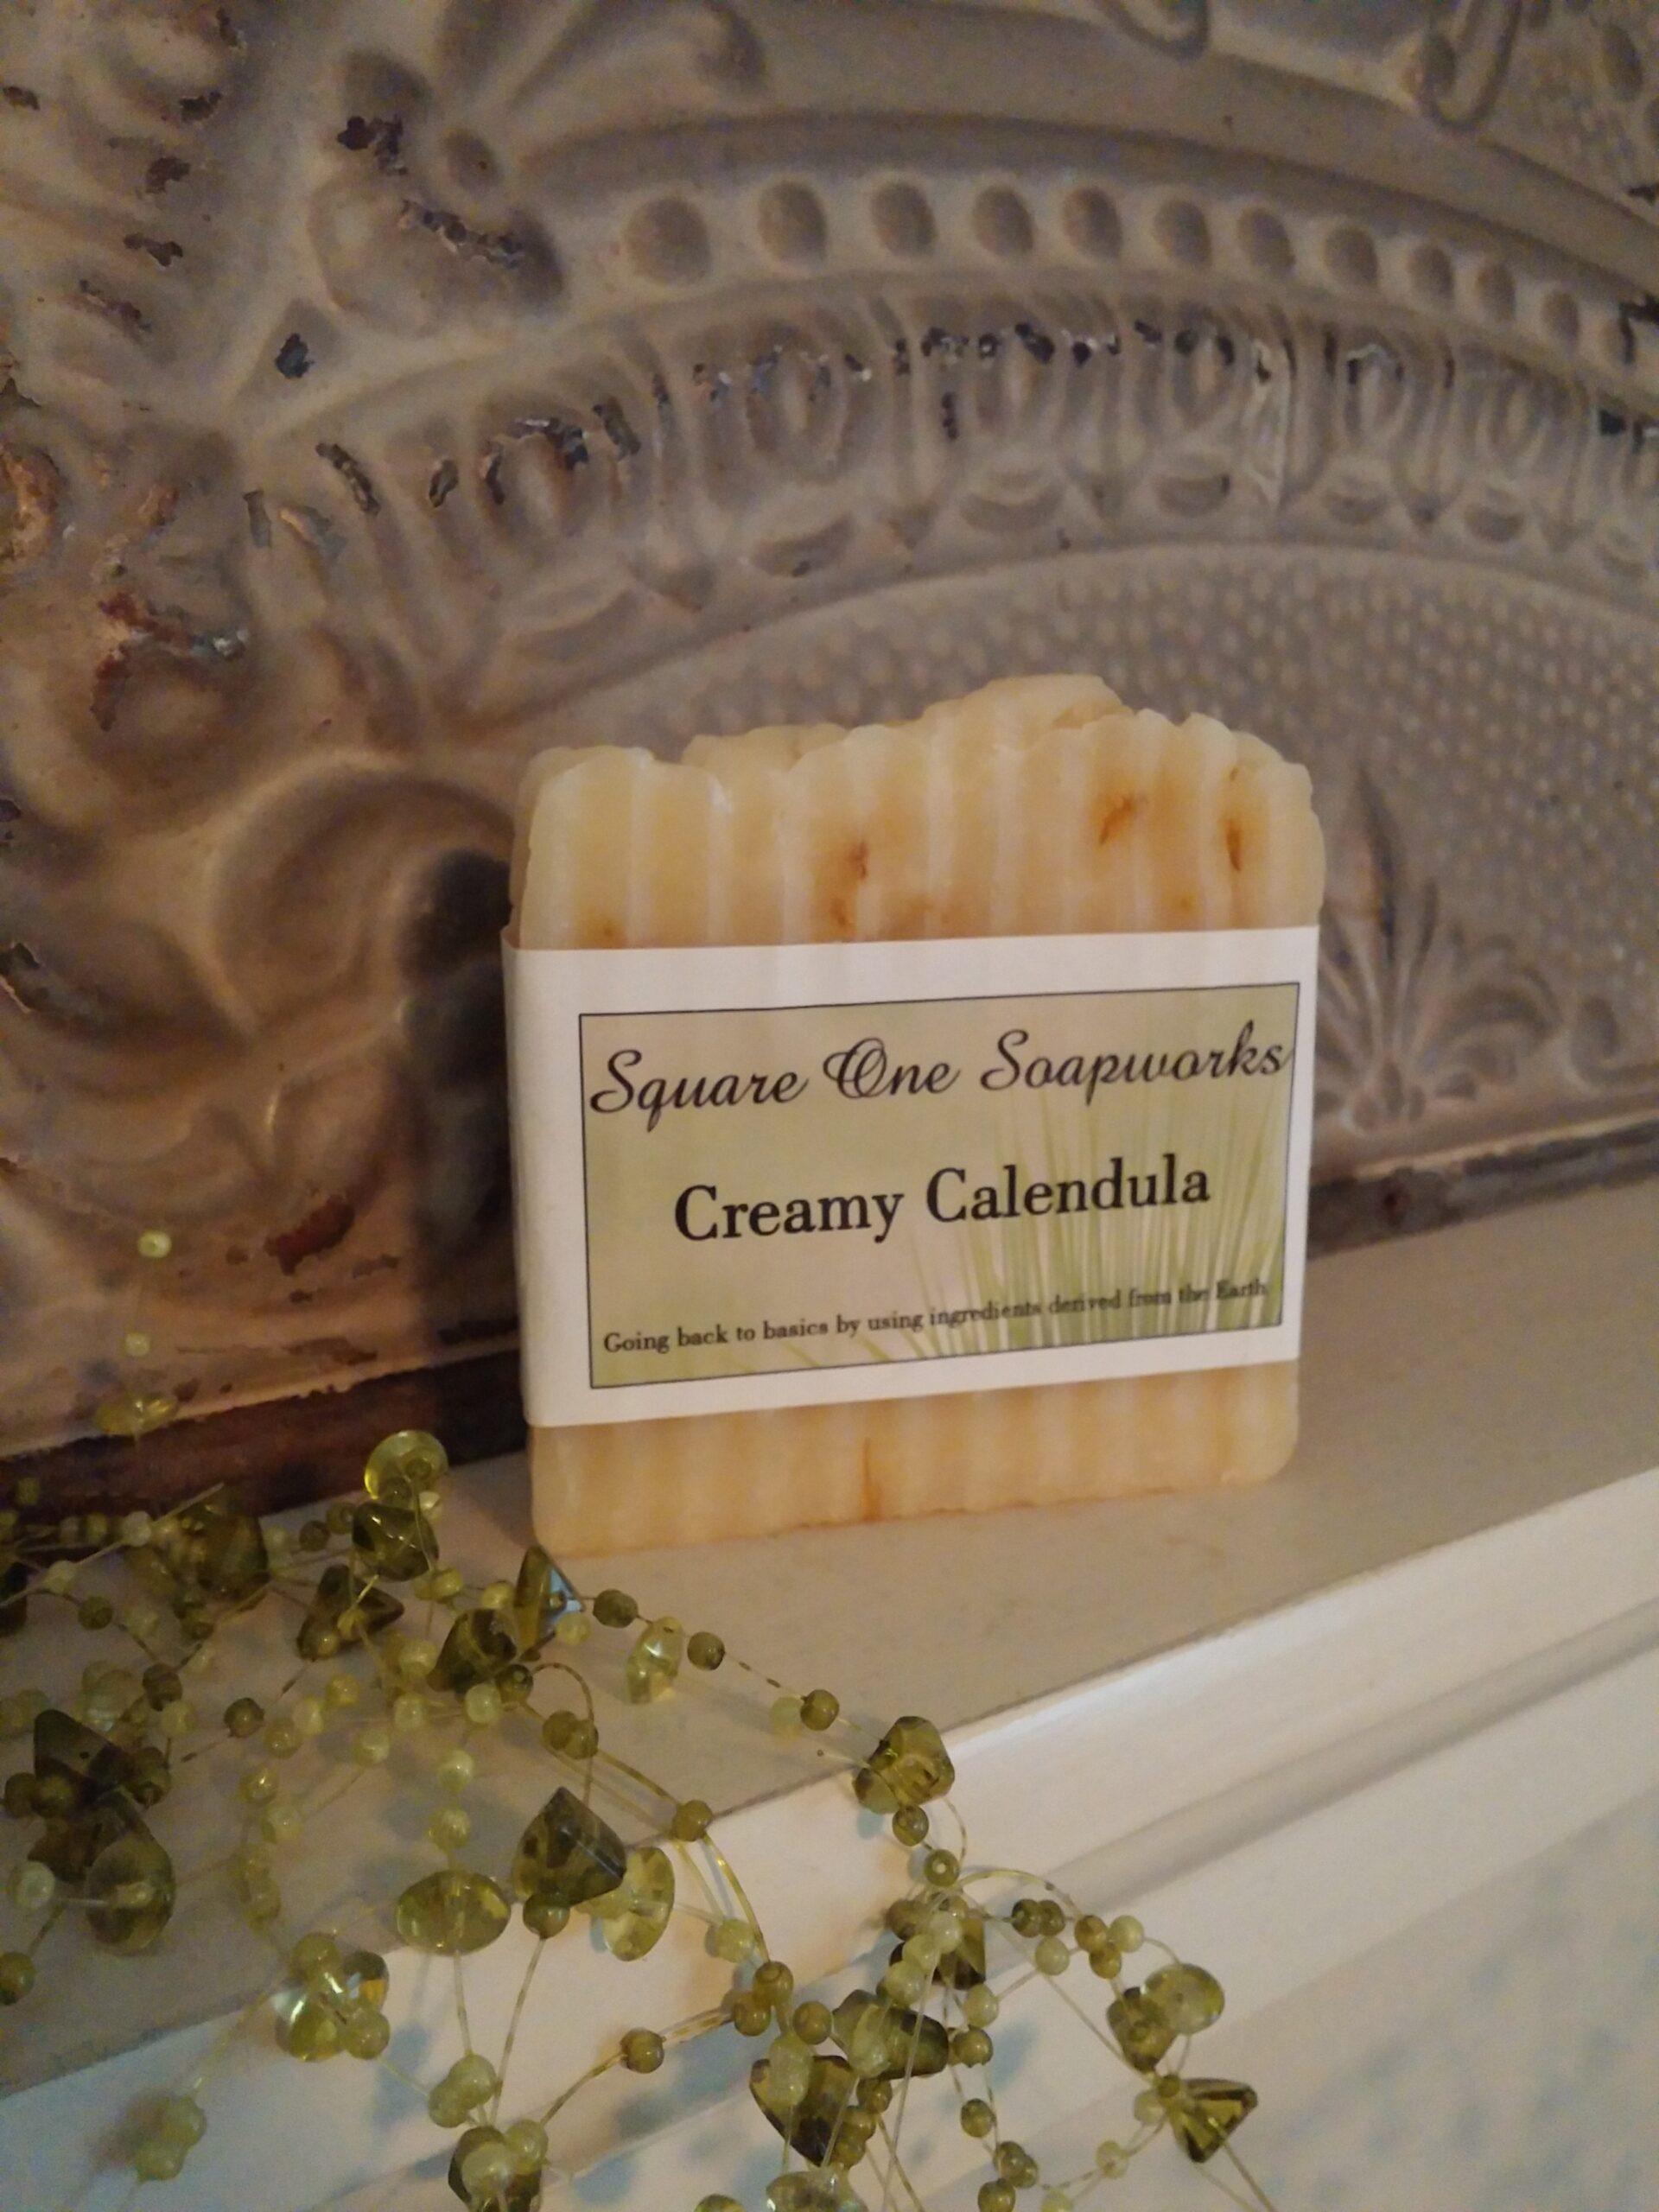 Creamy Calendula Full-Size Soap Bar - Square One Soapworks